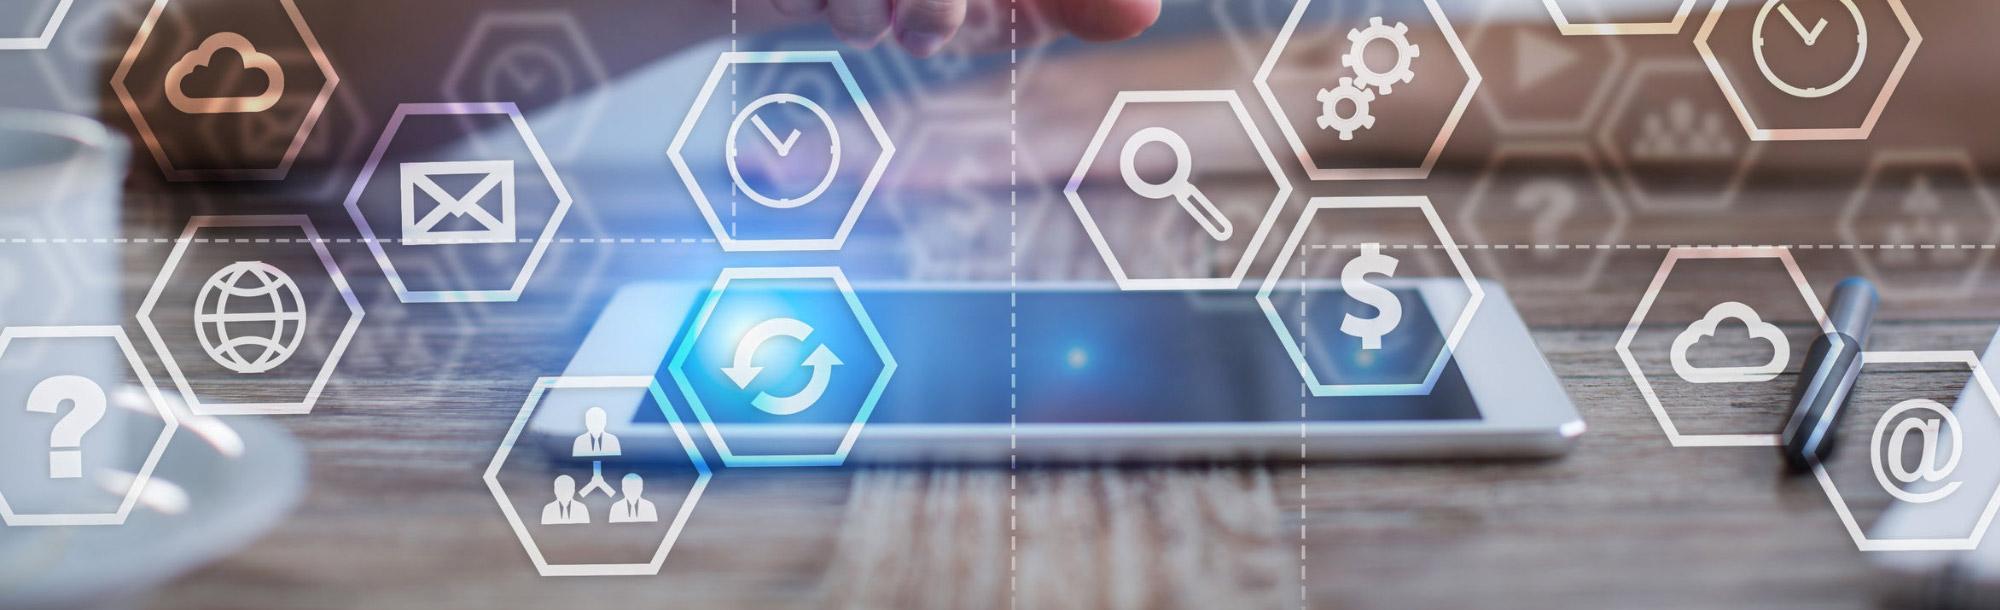 AWS Cloud Frankfurt - Amazon Web Services - Paas - SaaS - IaaS